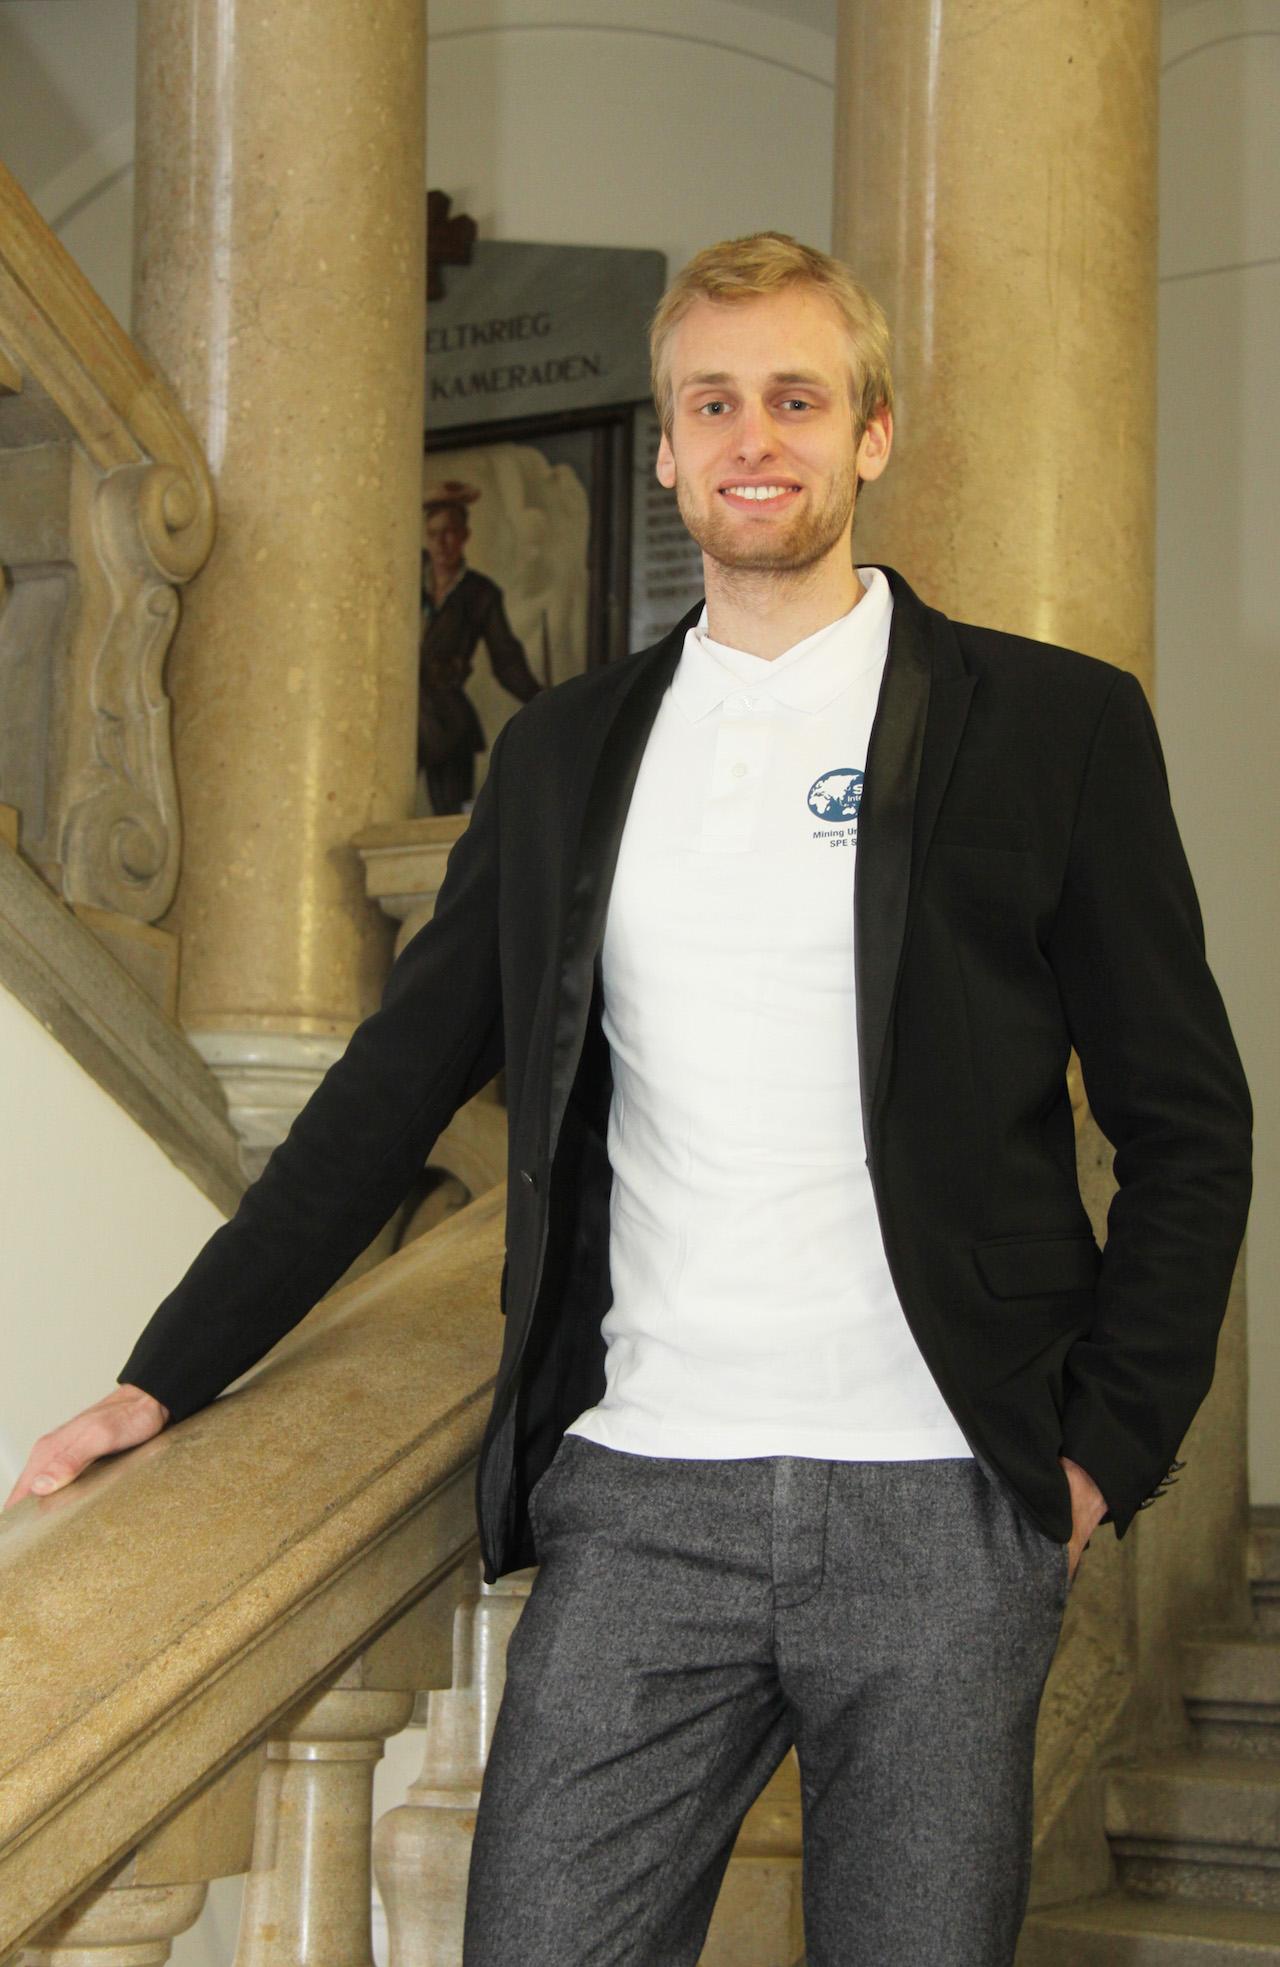 Jakob Petutschnig - Public Relation Officer - Sponsoring Secretary